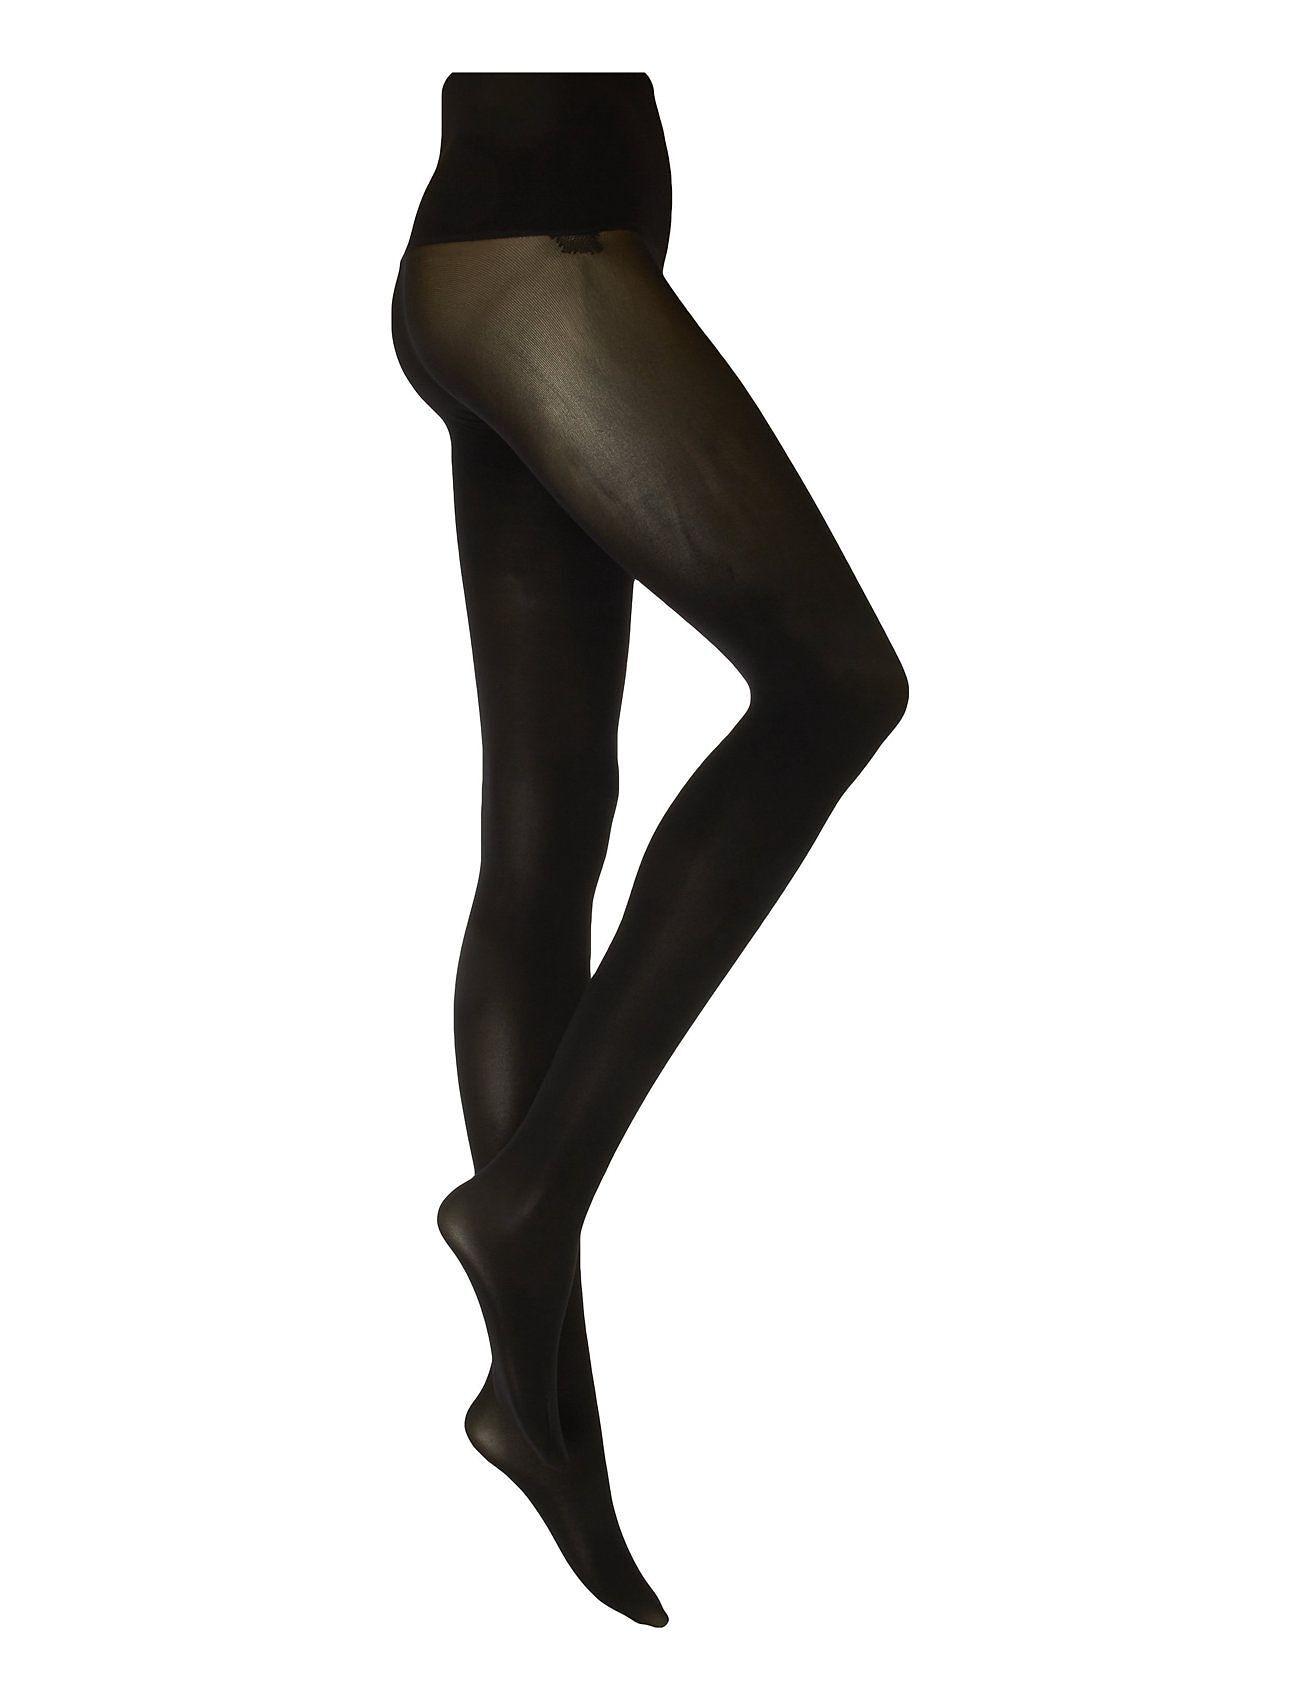 Image of Swedish Stockings Hanna Premium Seamless Tights 40d Sukkahousut Musta Swedish Stockings